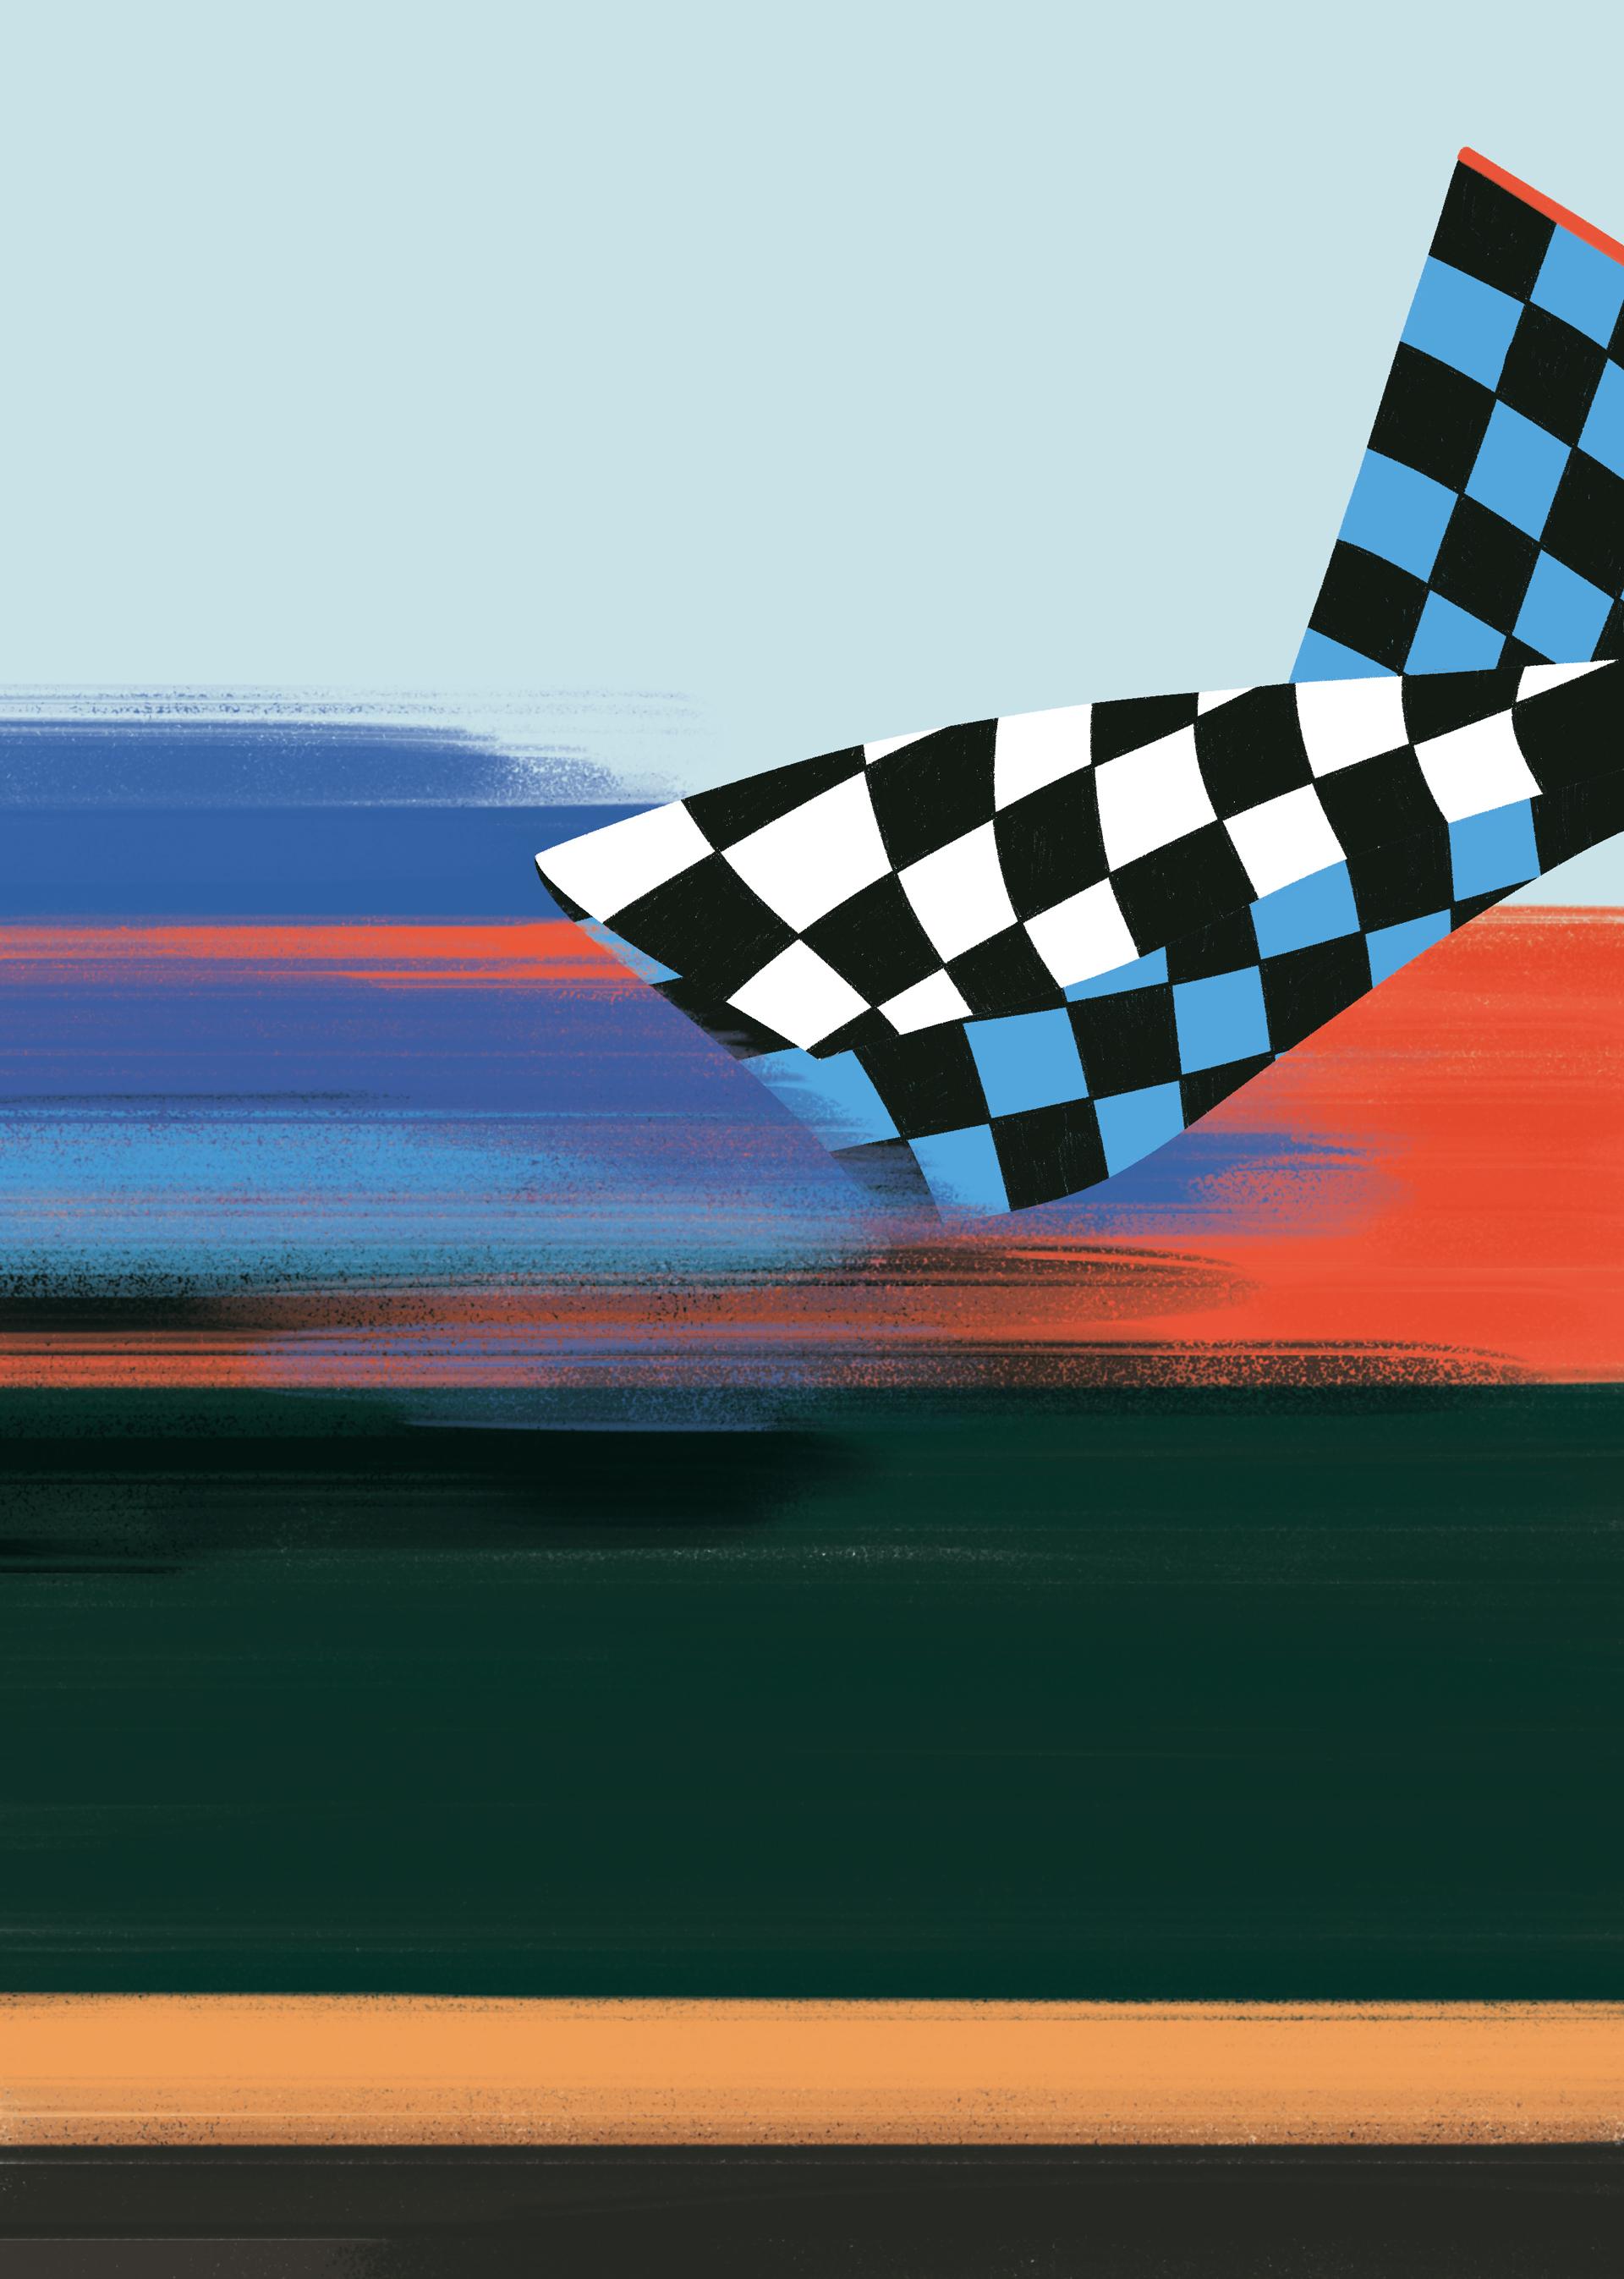 181204_Soffa_Le-Mans_02_new.jpg